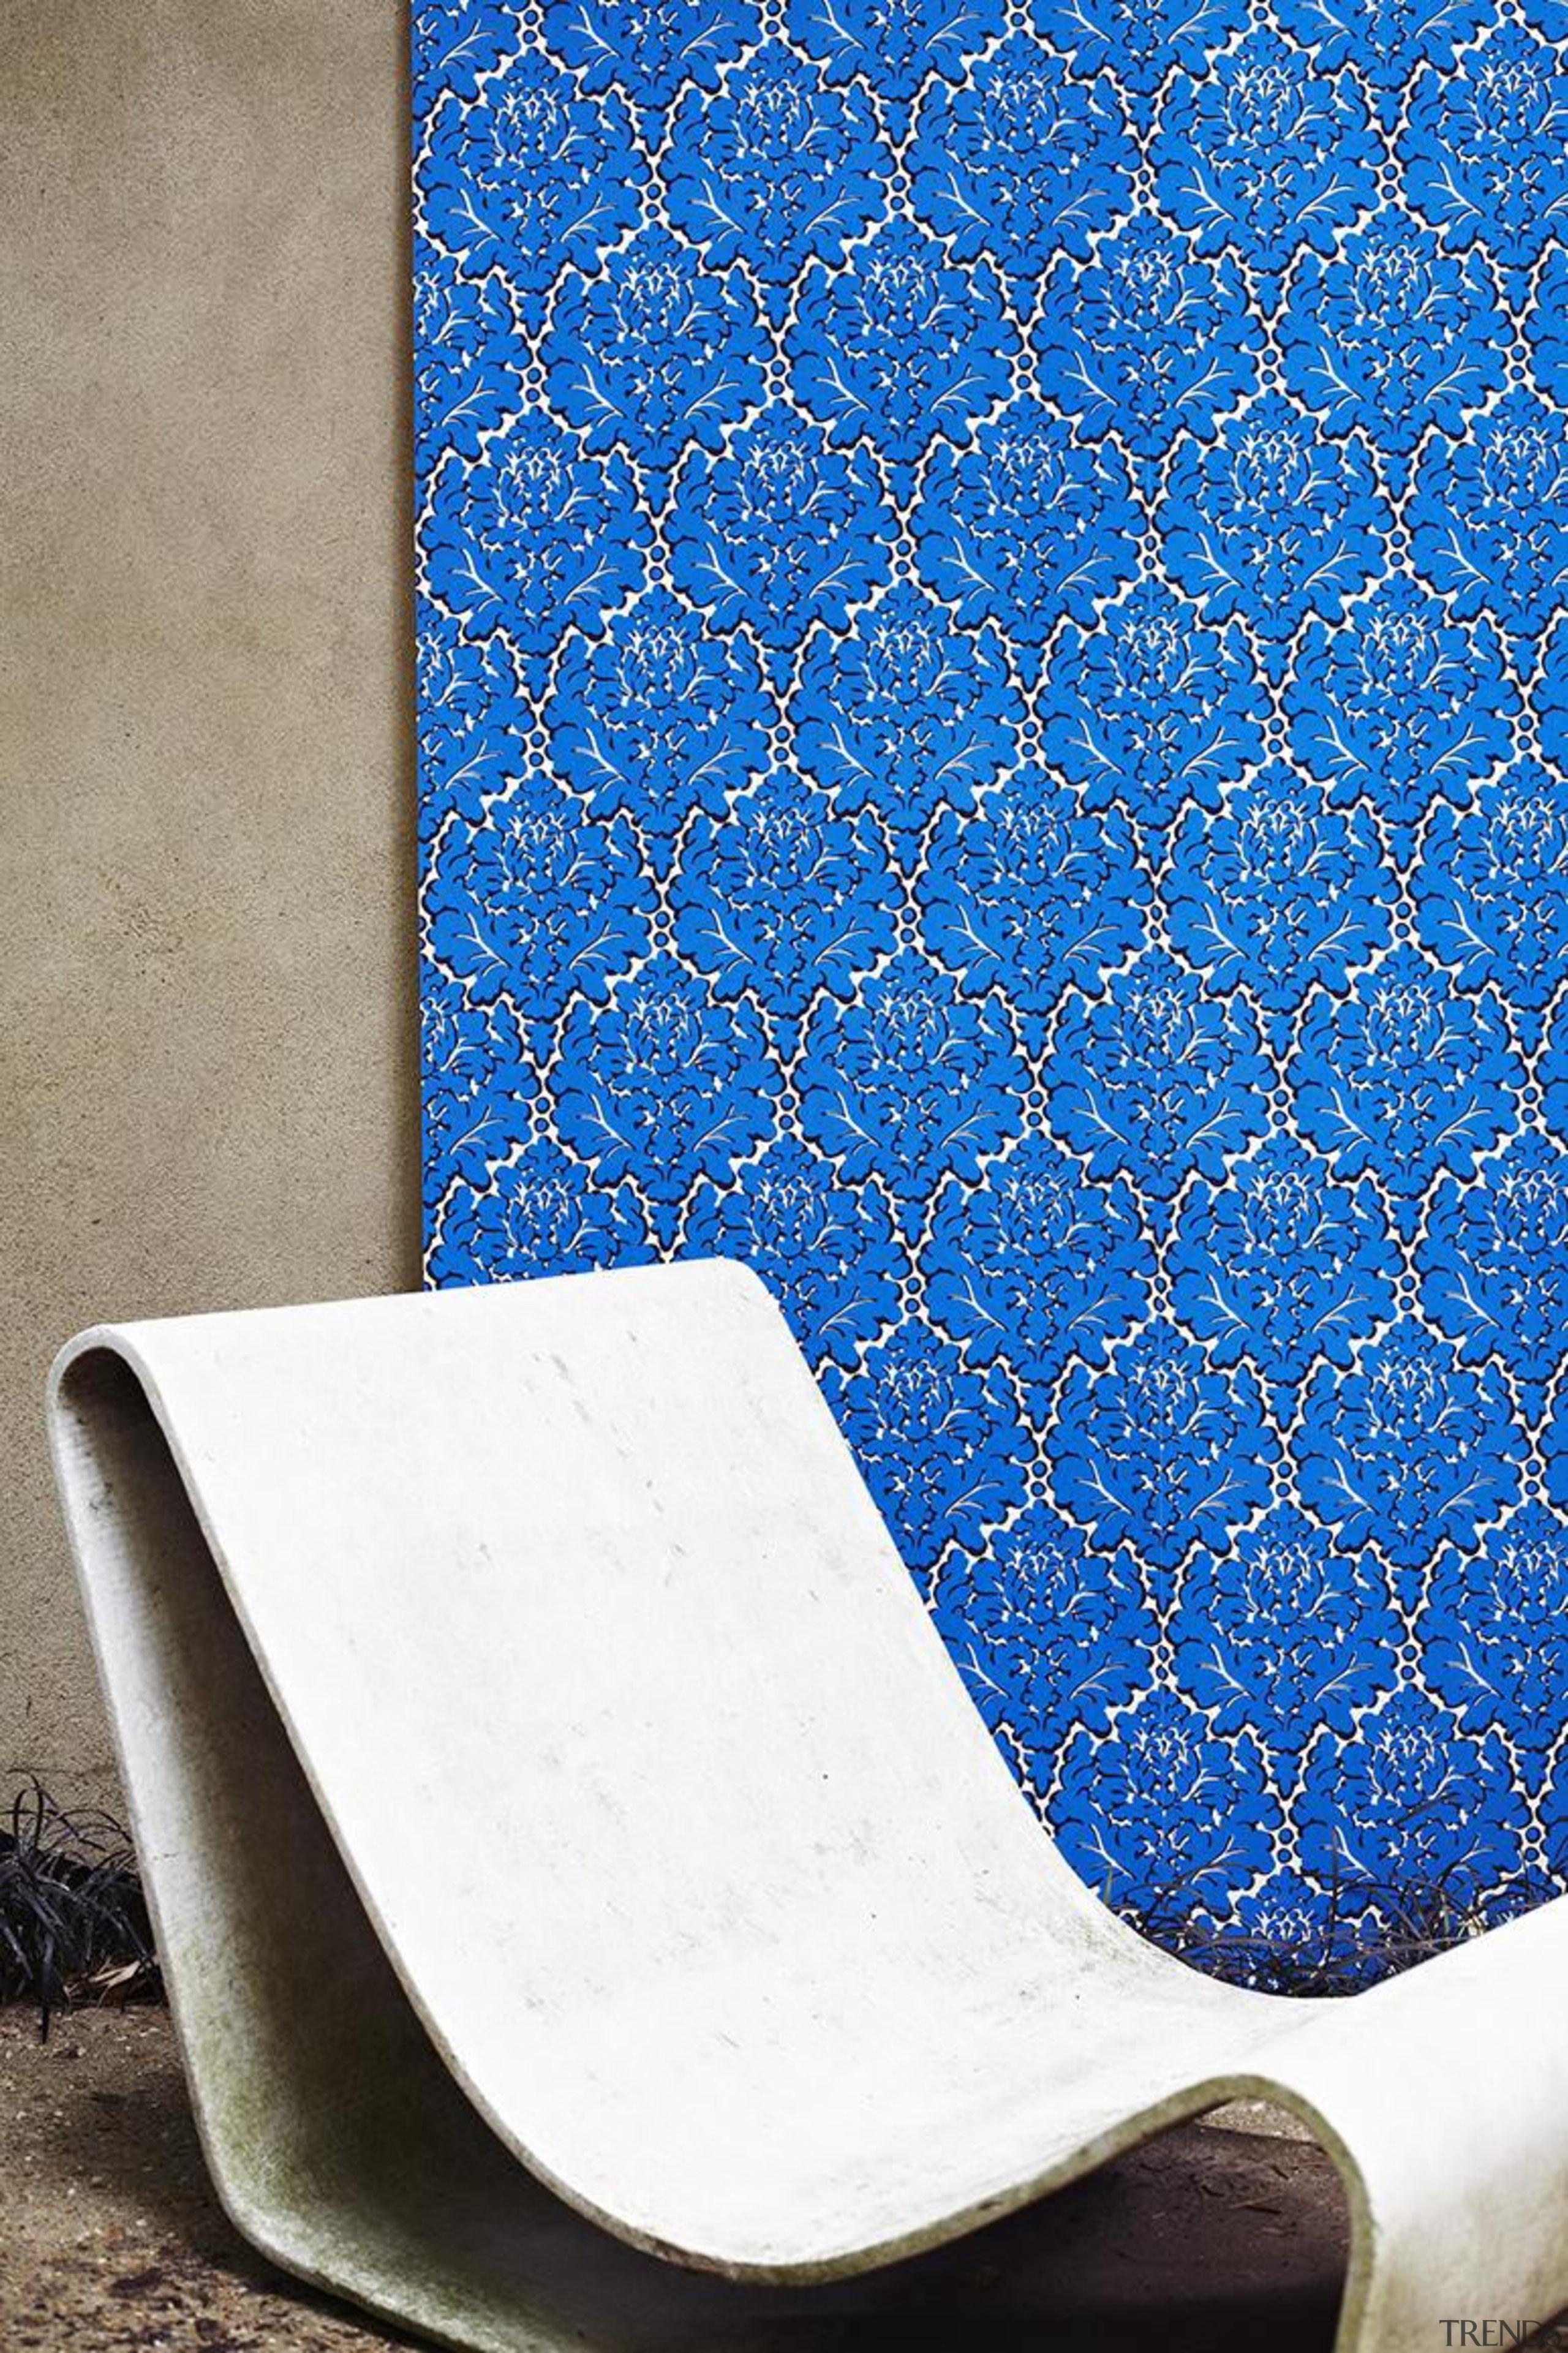 Eley Kishimoto Hand-Printed Wallpaper Collection - Eley Kishimoto blue, chair, design, pattern, product design, wallpaper, blue, white